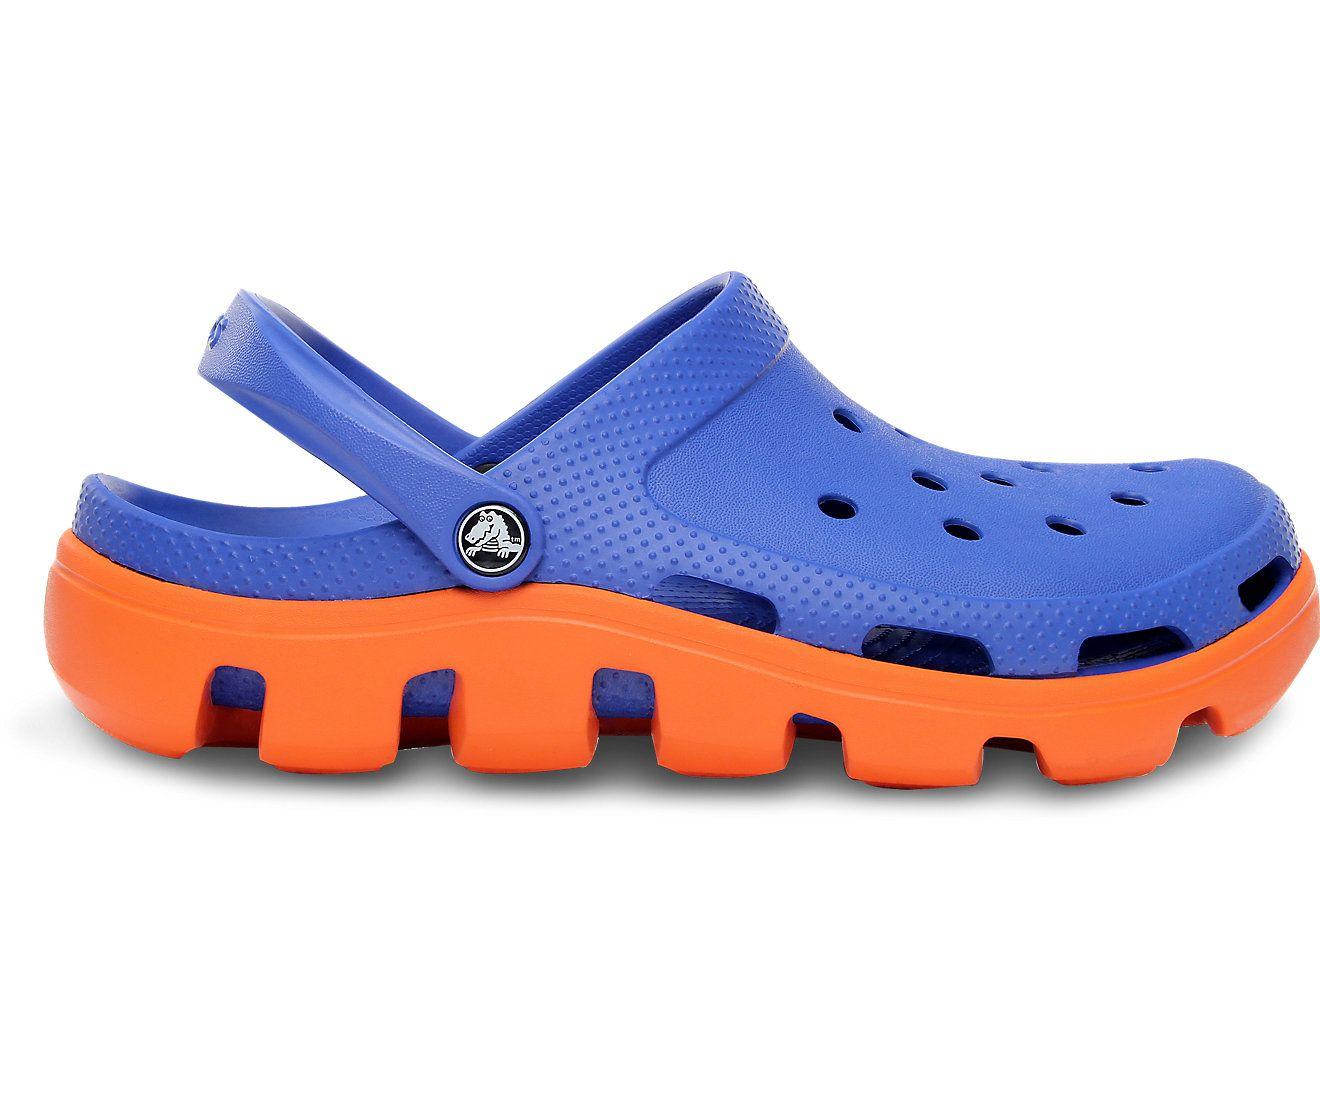 diferentemente ad218 fe90b Comfortable Gardening Shoes | Crocs™ Garden Shoes, Clogs ...